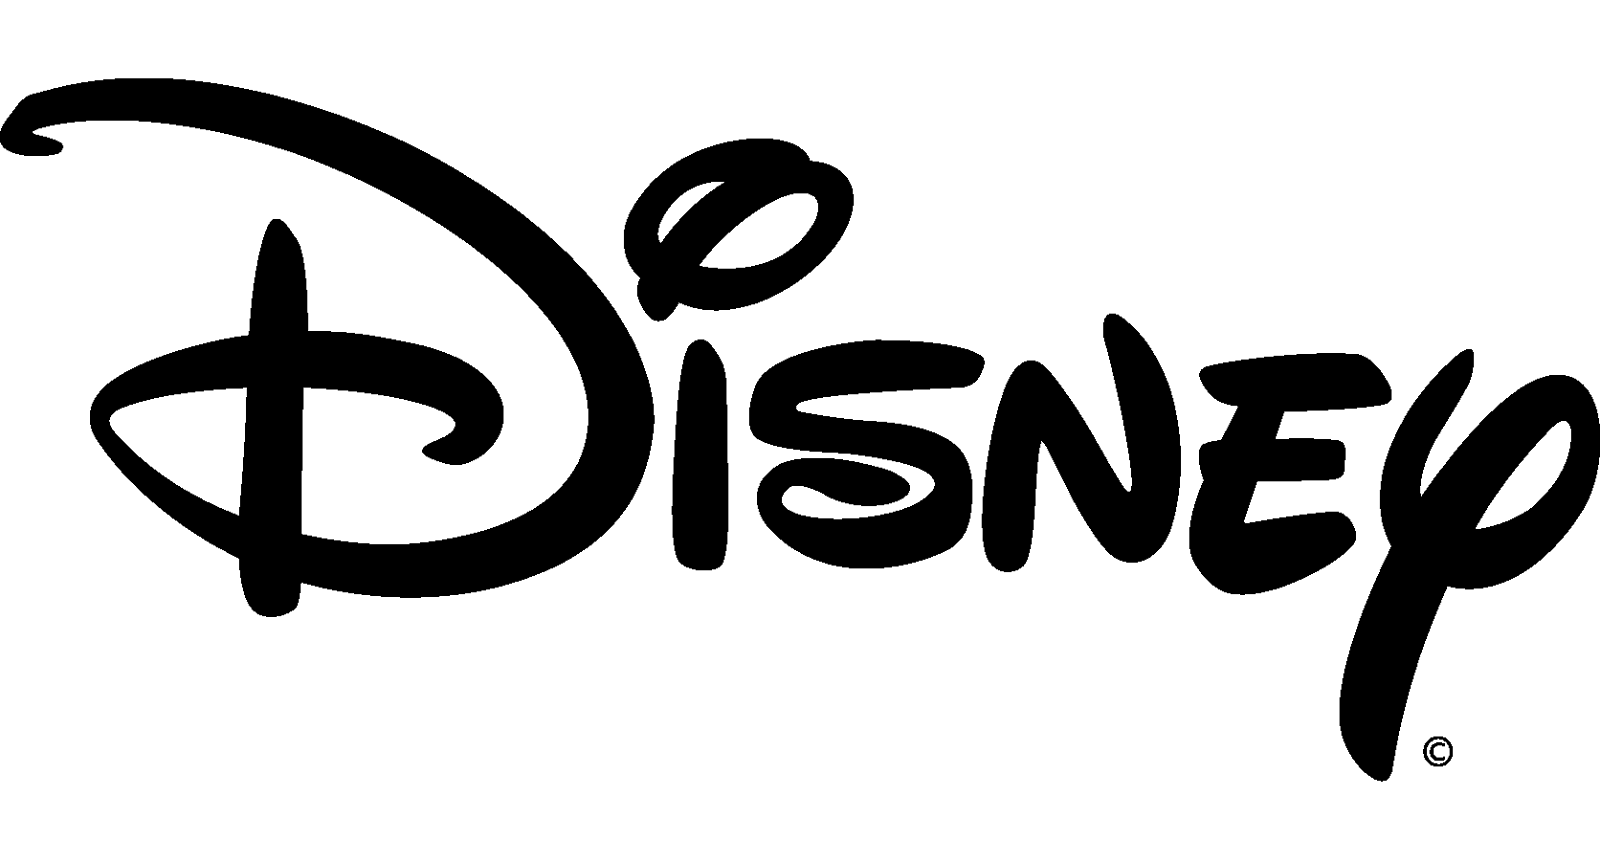 Disney copyright symbol biocorpaavc